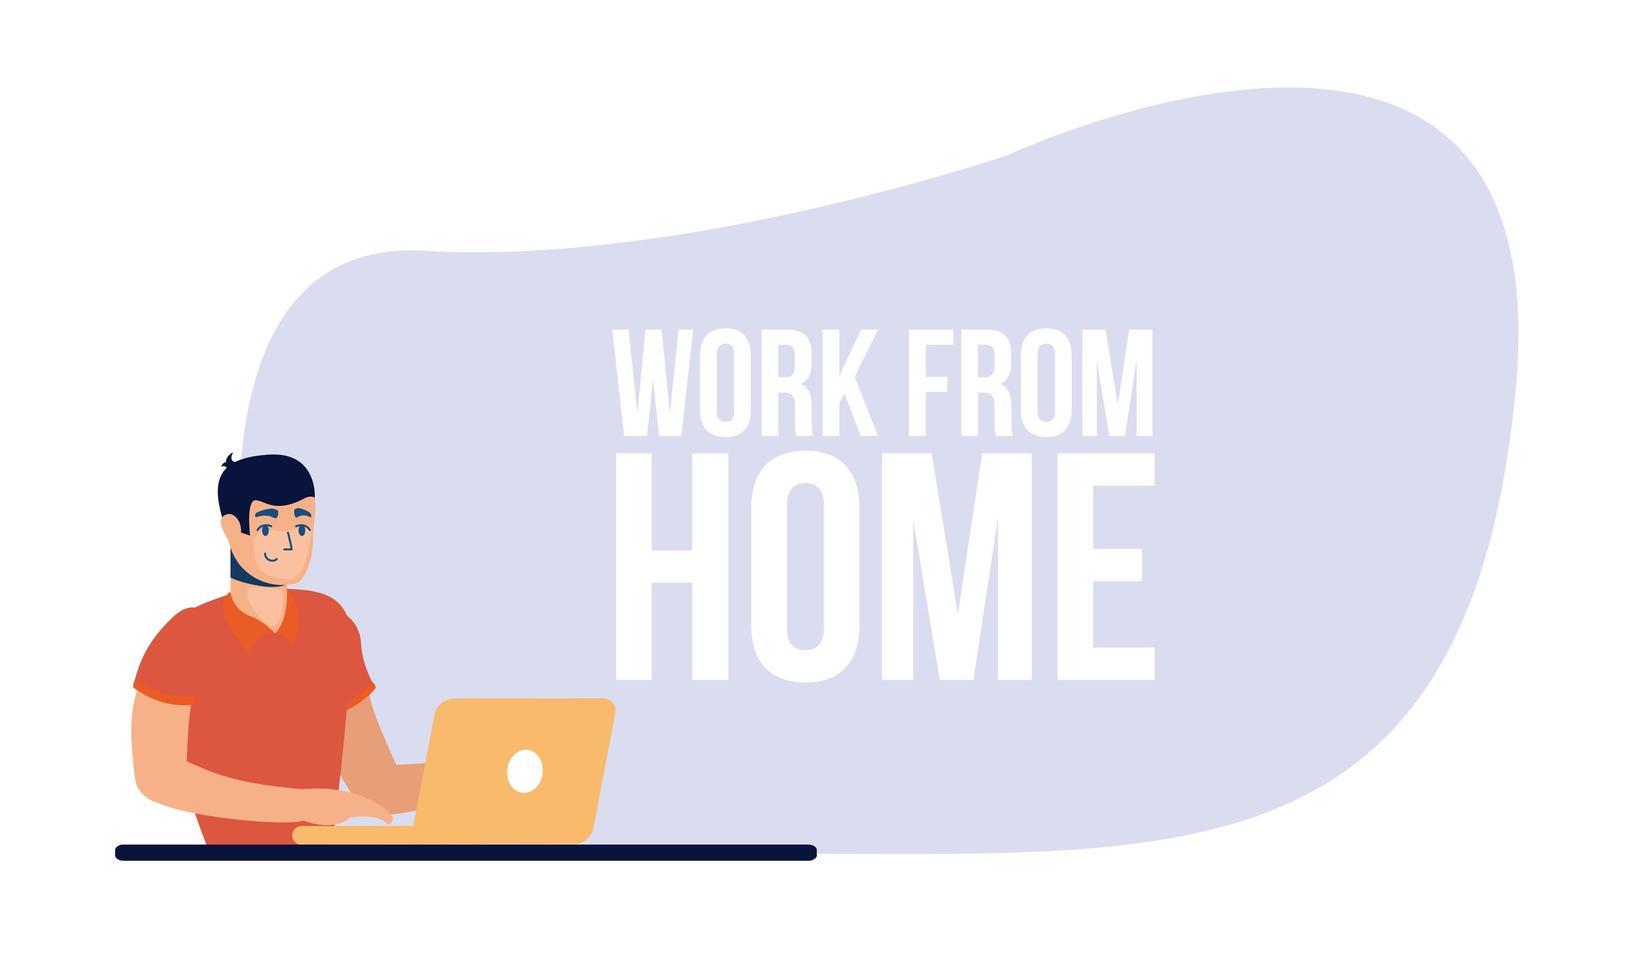 man met laptop en werk vanuit huis vector ontwerp